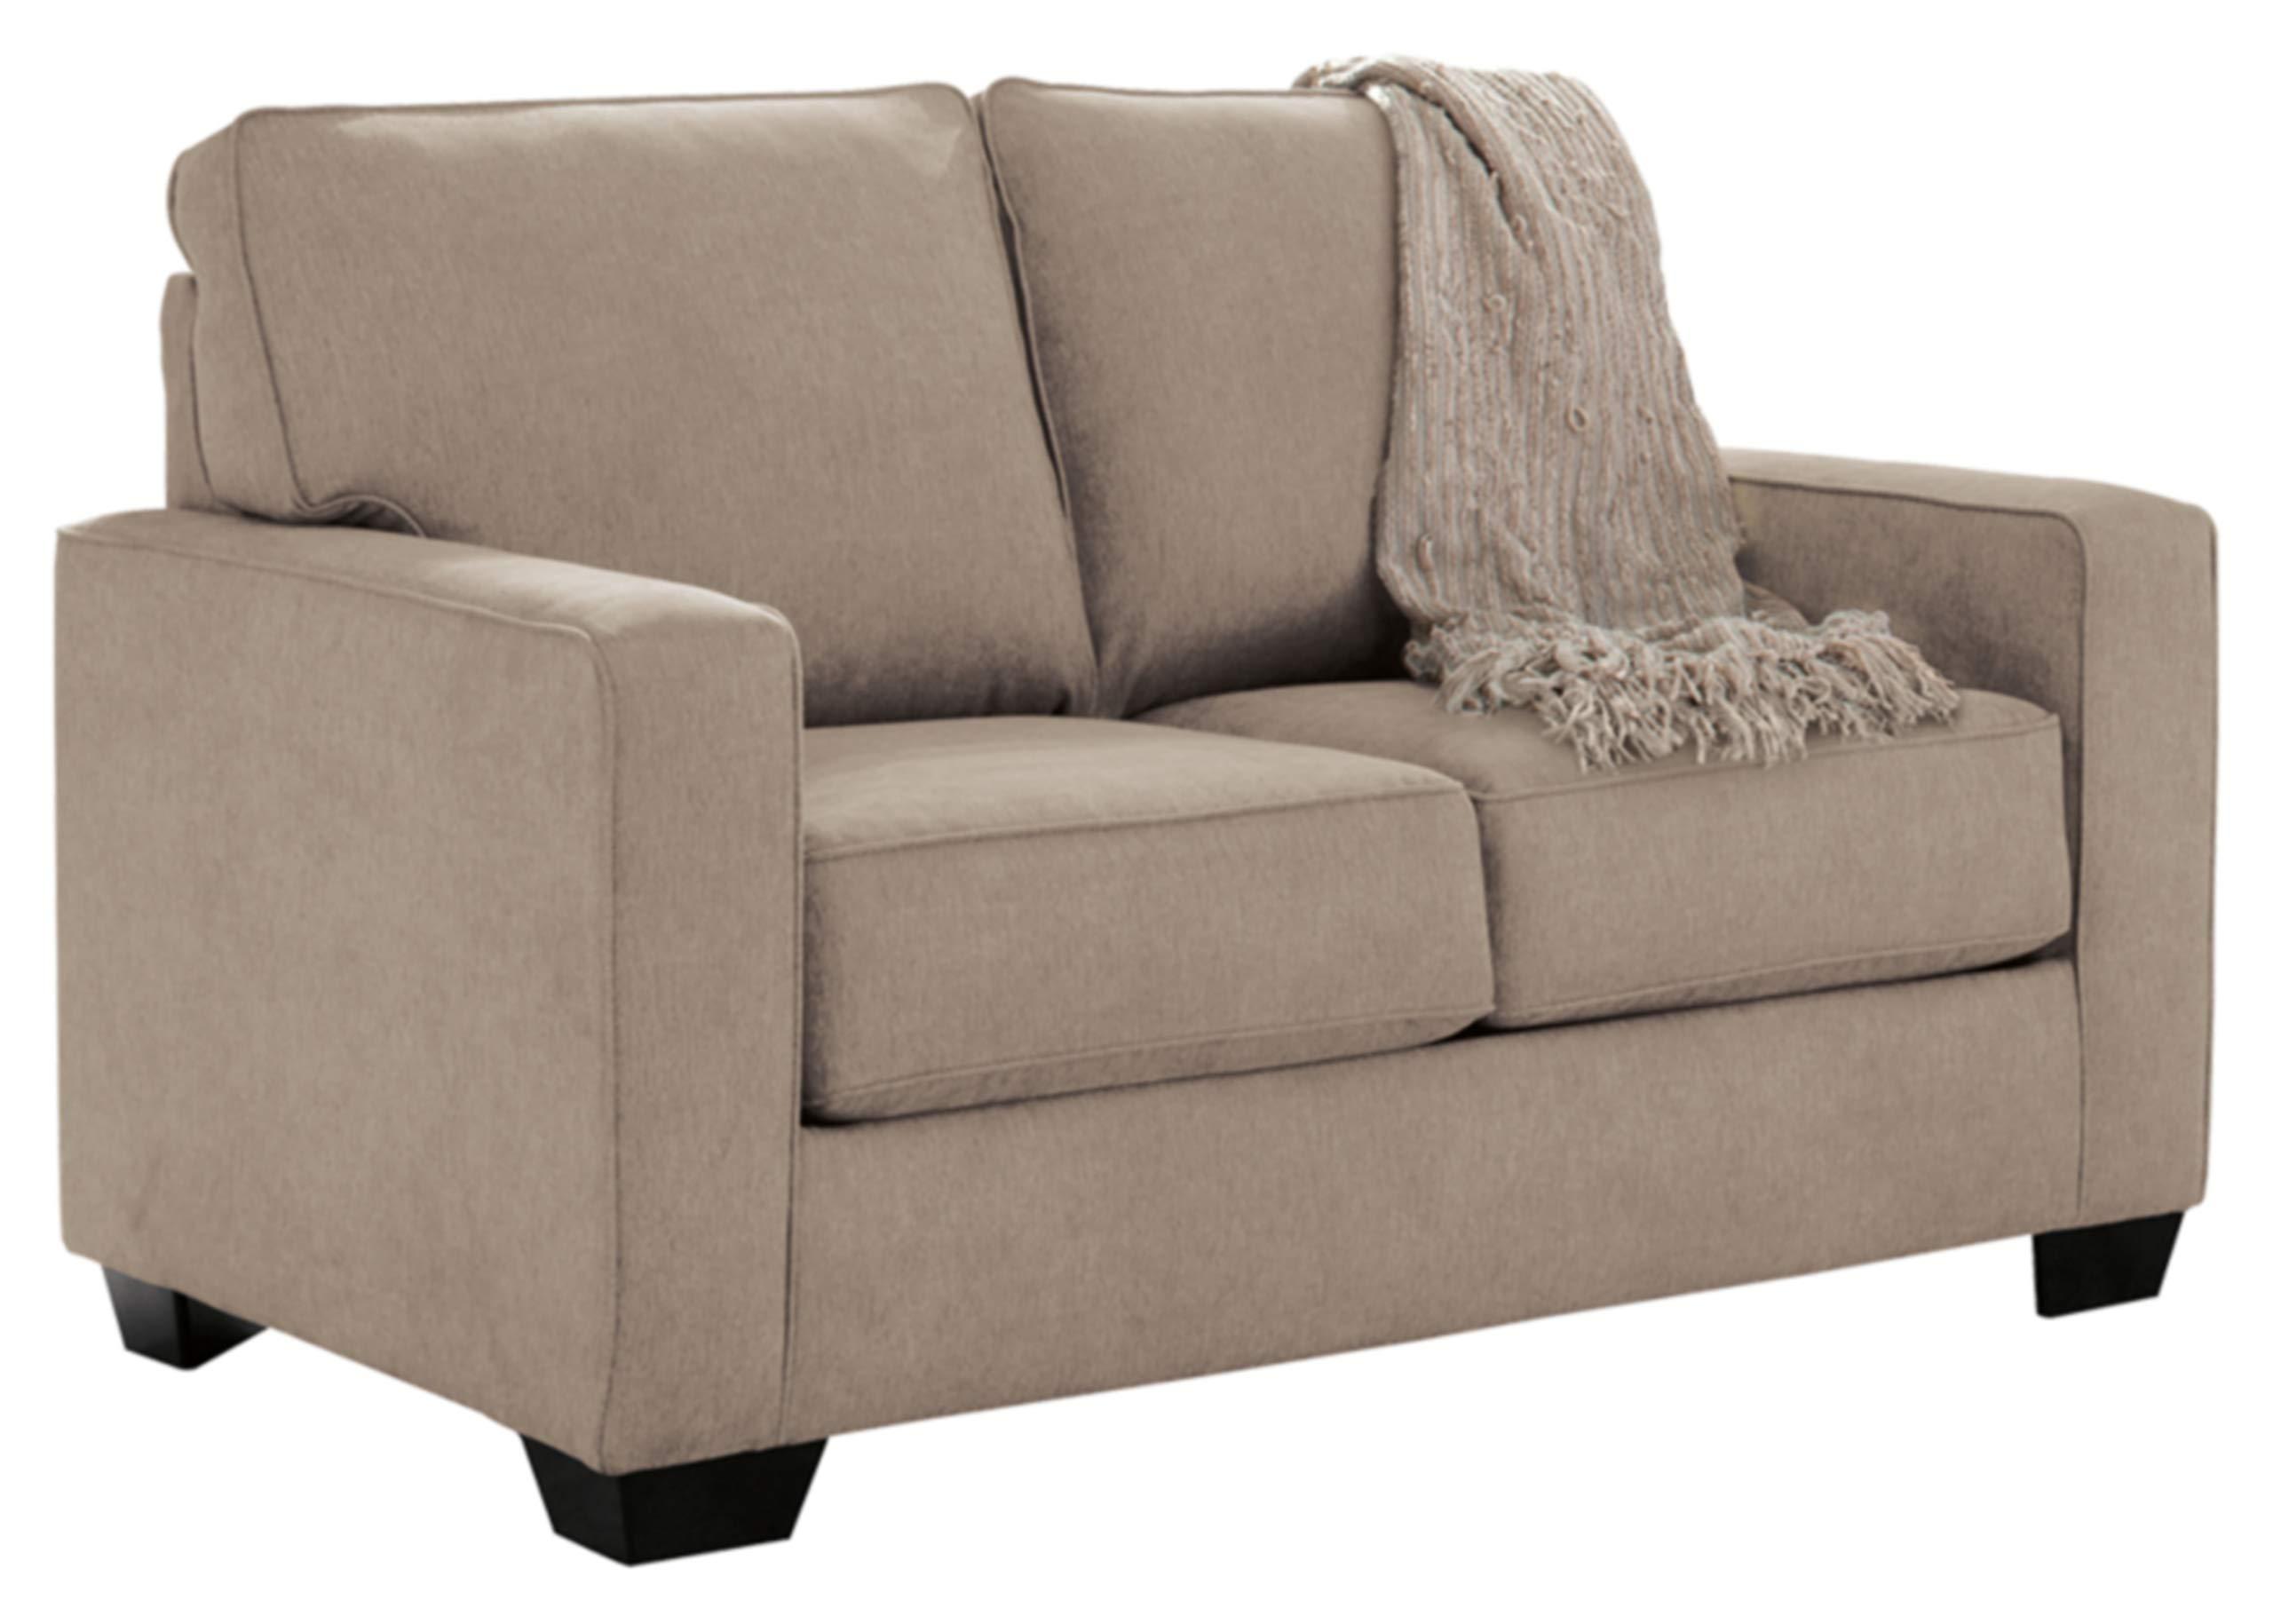 sleeper sofa twin amazon com rh amazon com twin size sofa chair twin chair sofa bed